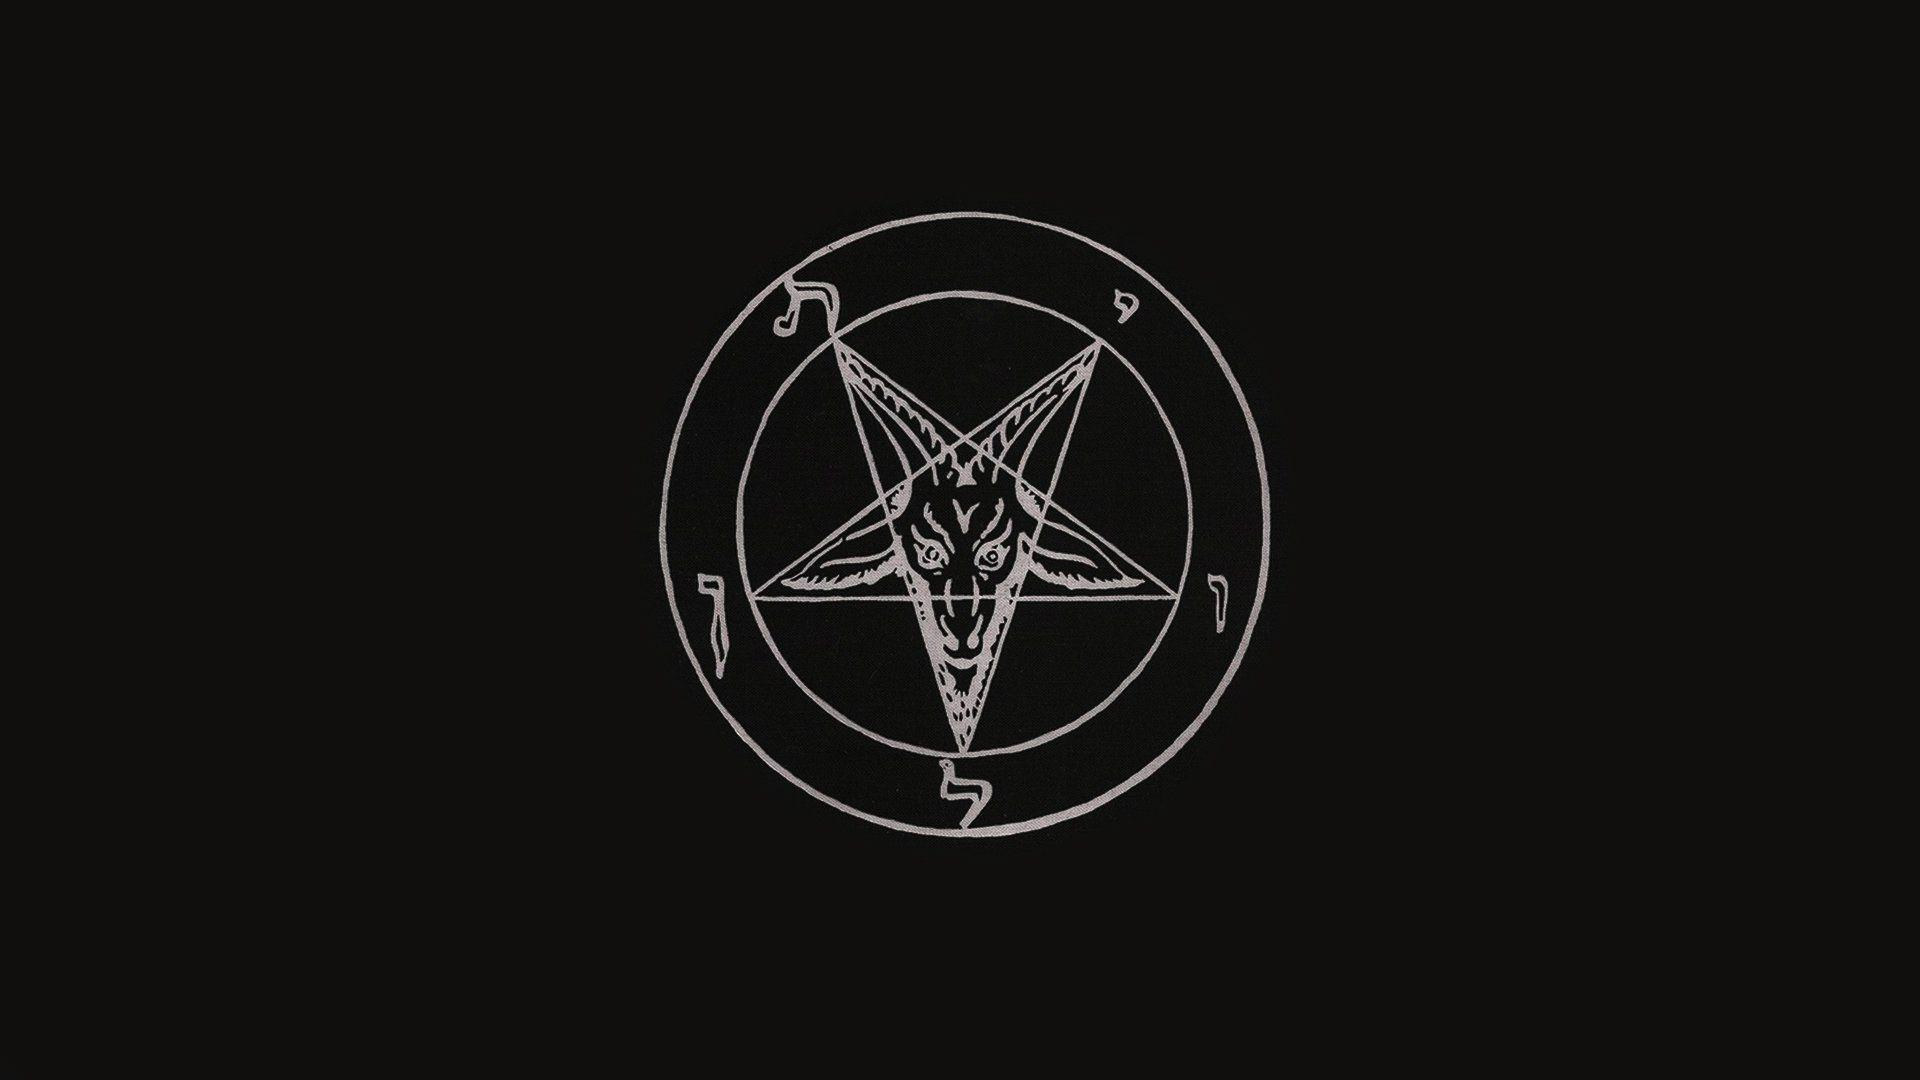 Shigeru onda baphomet pinterest baphomet and occult shigeru onda baphomet pinterest baphomet and occult voltagebd Image collections